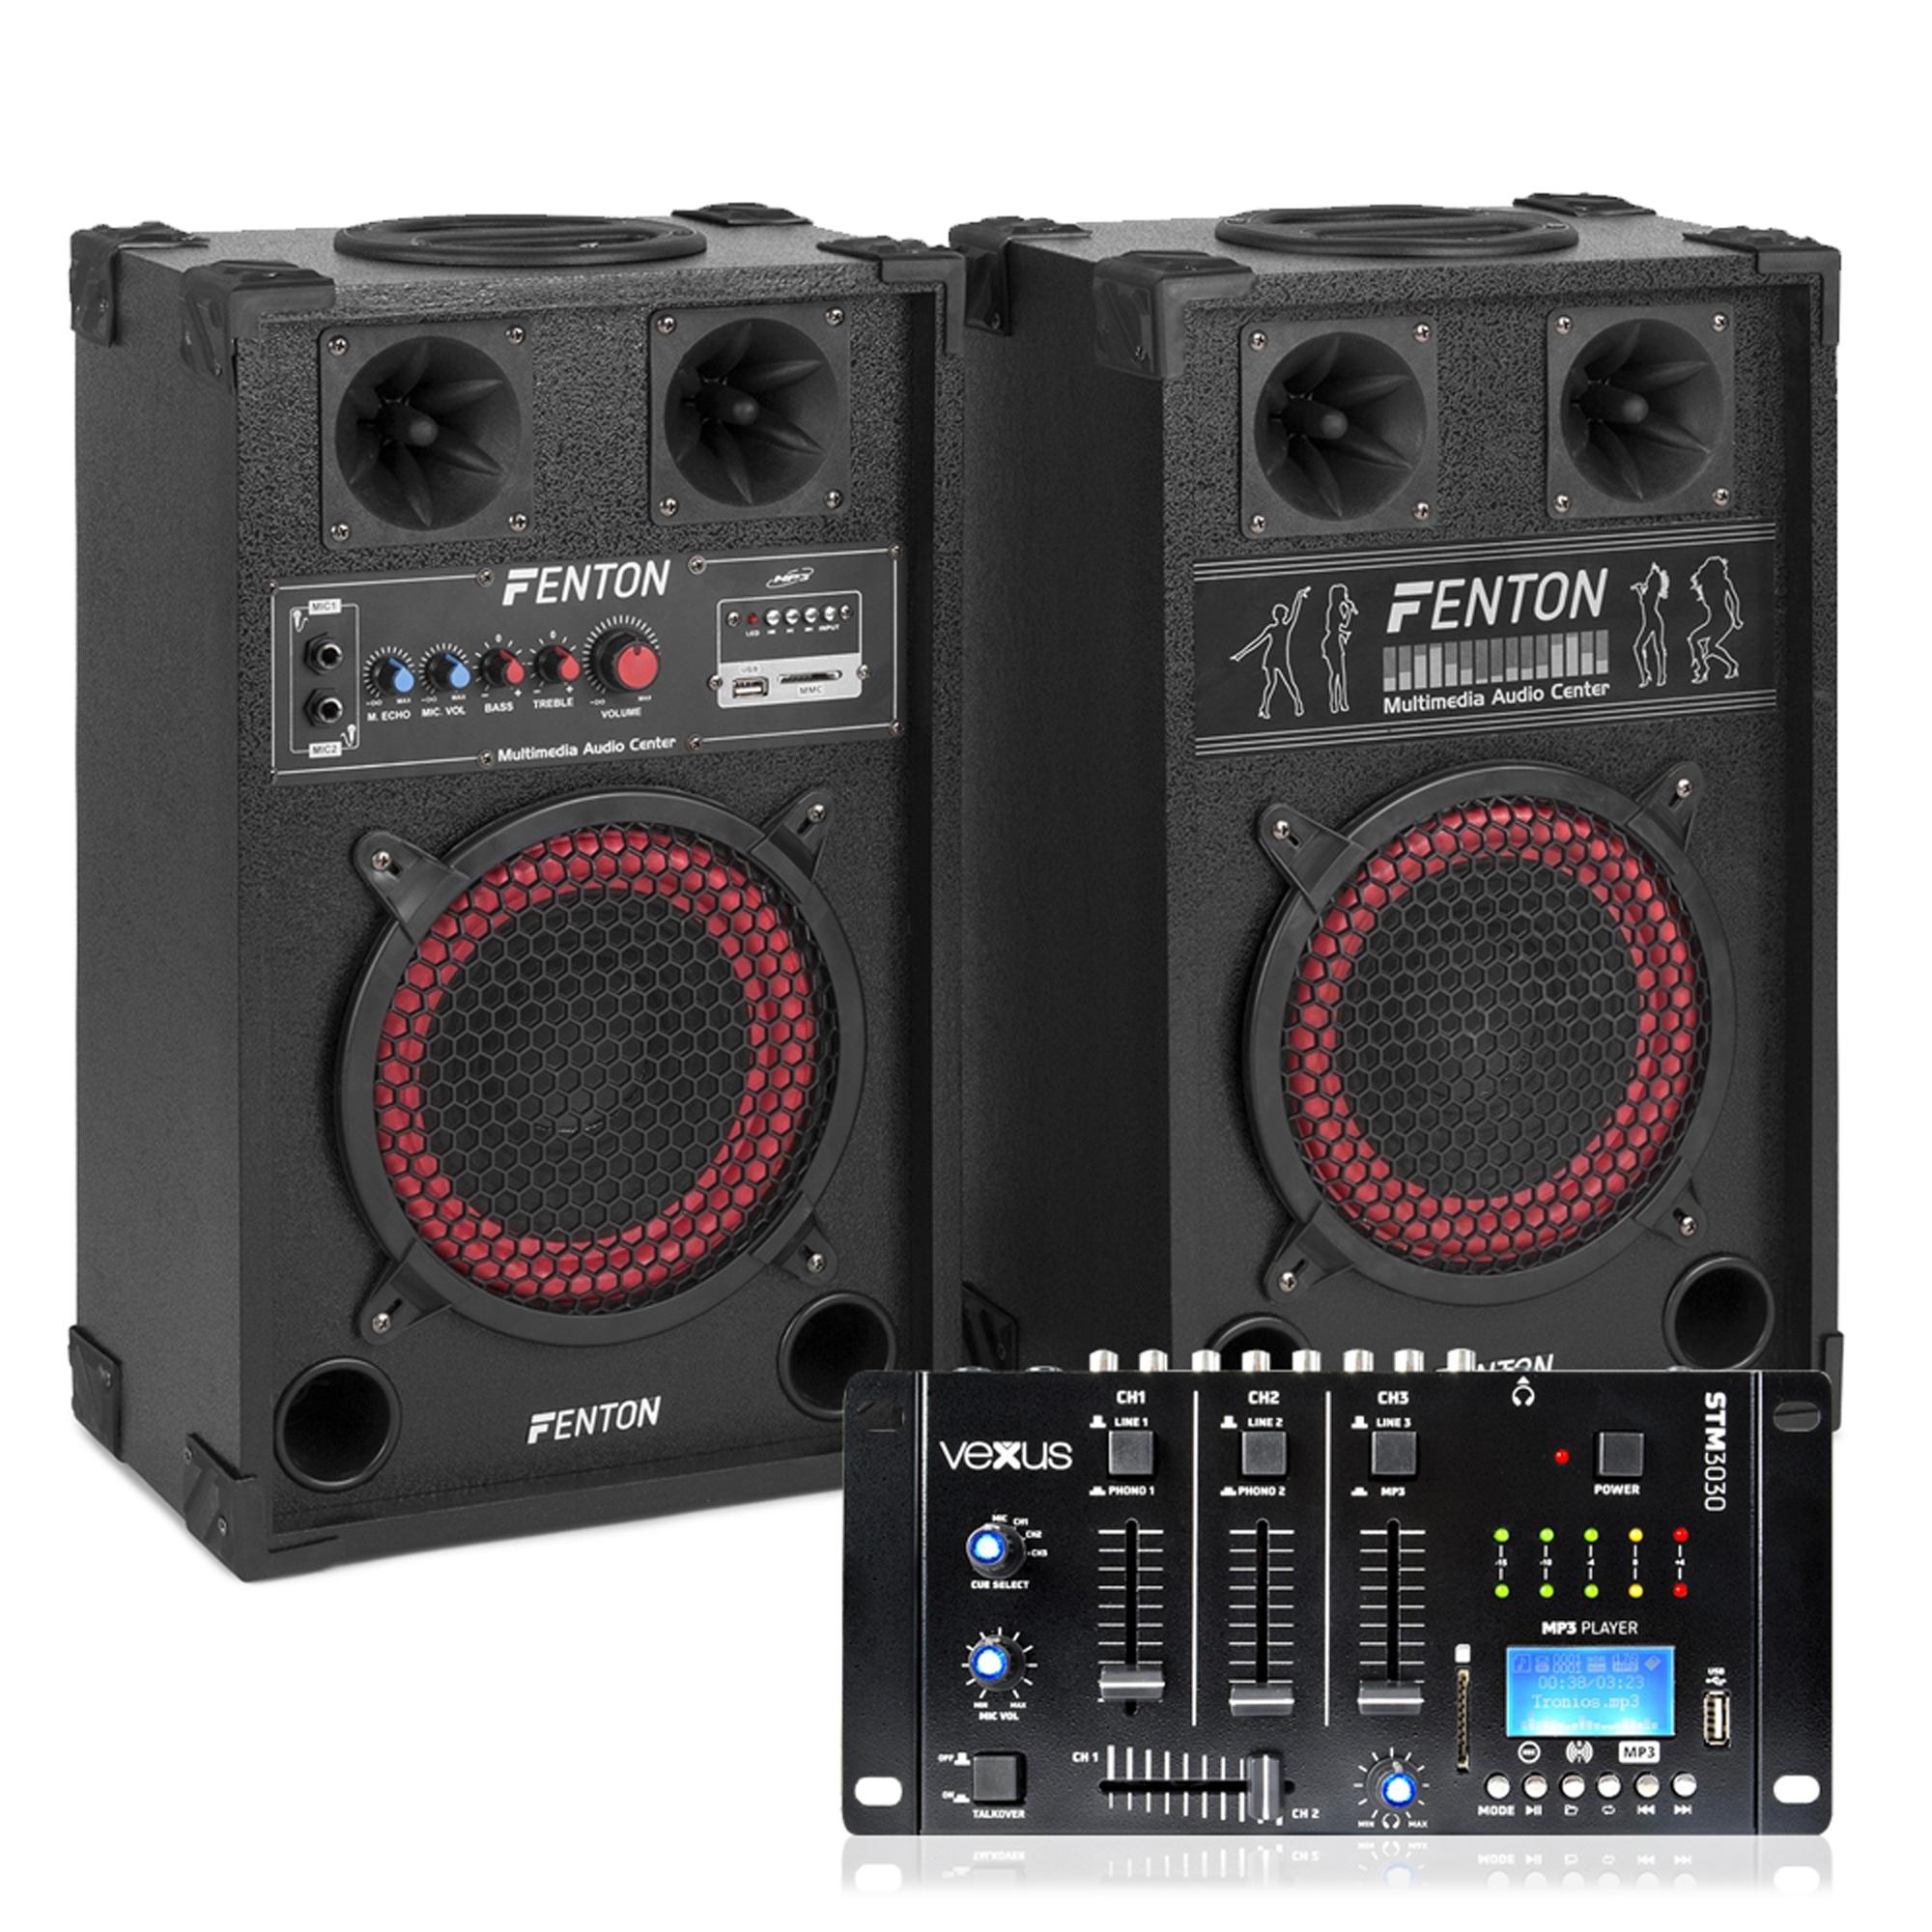 Fenton SPB-8 Bluetooth Active Party PA Speaker Pair with Mixer